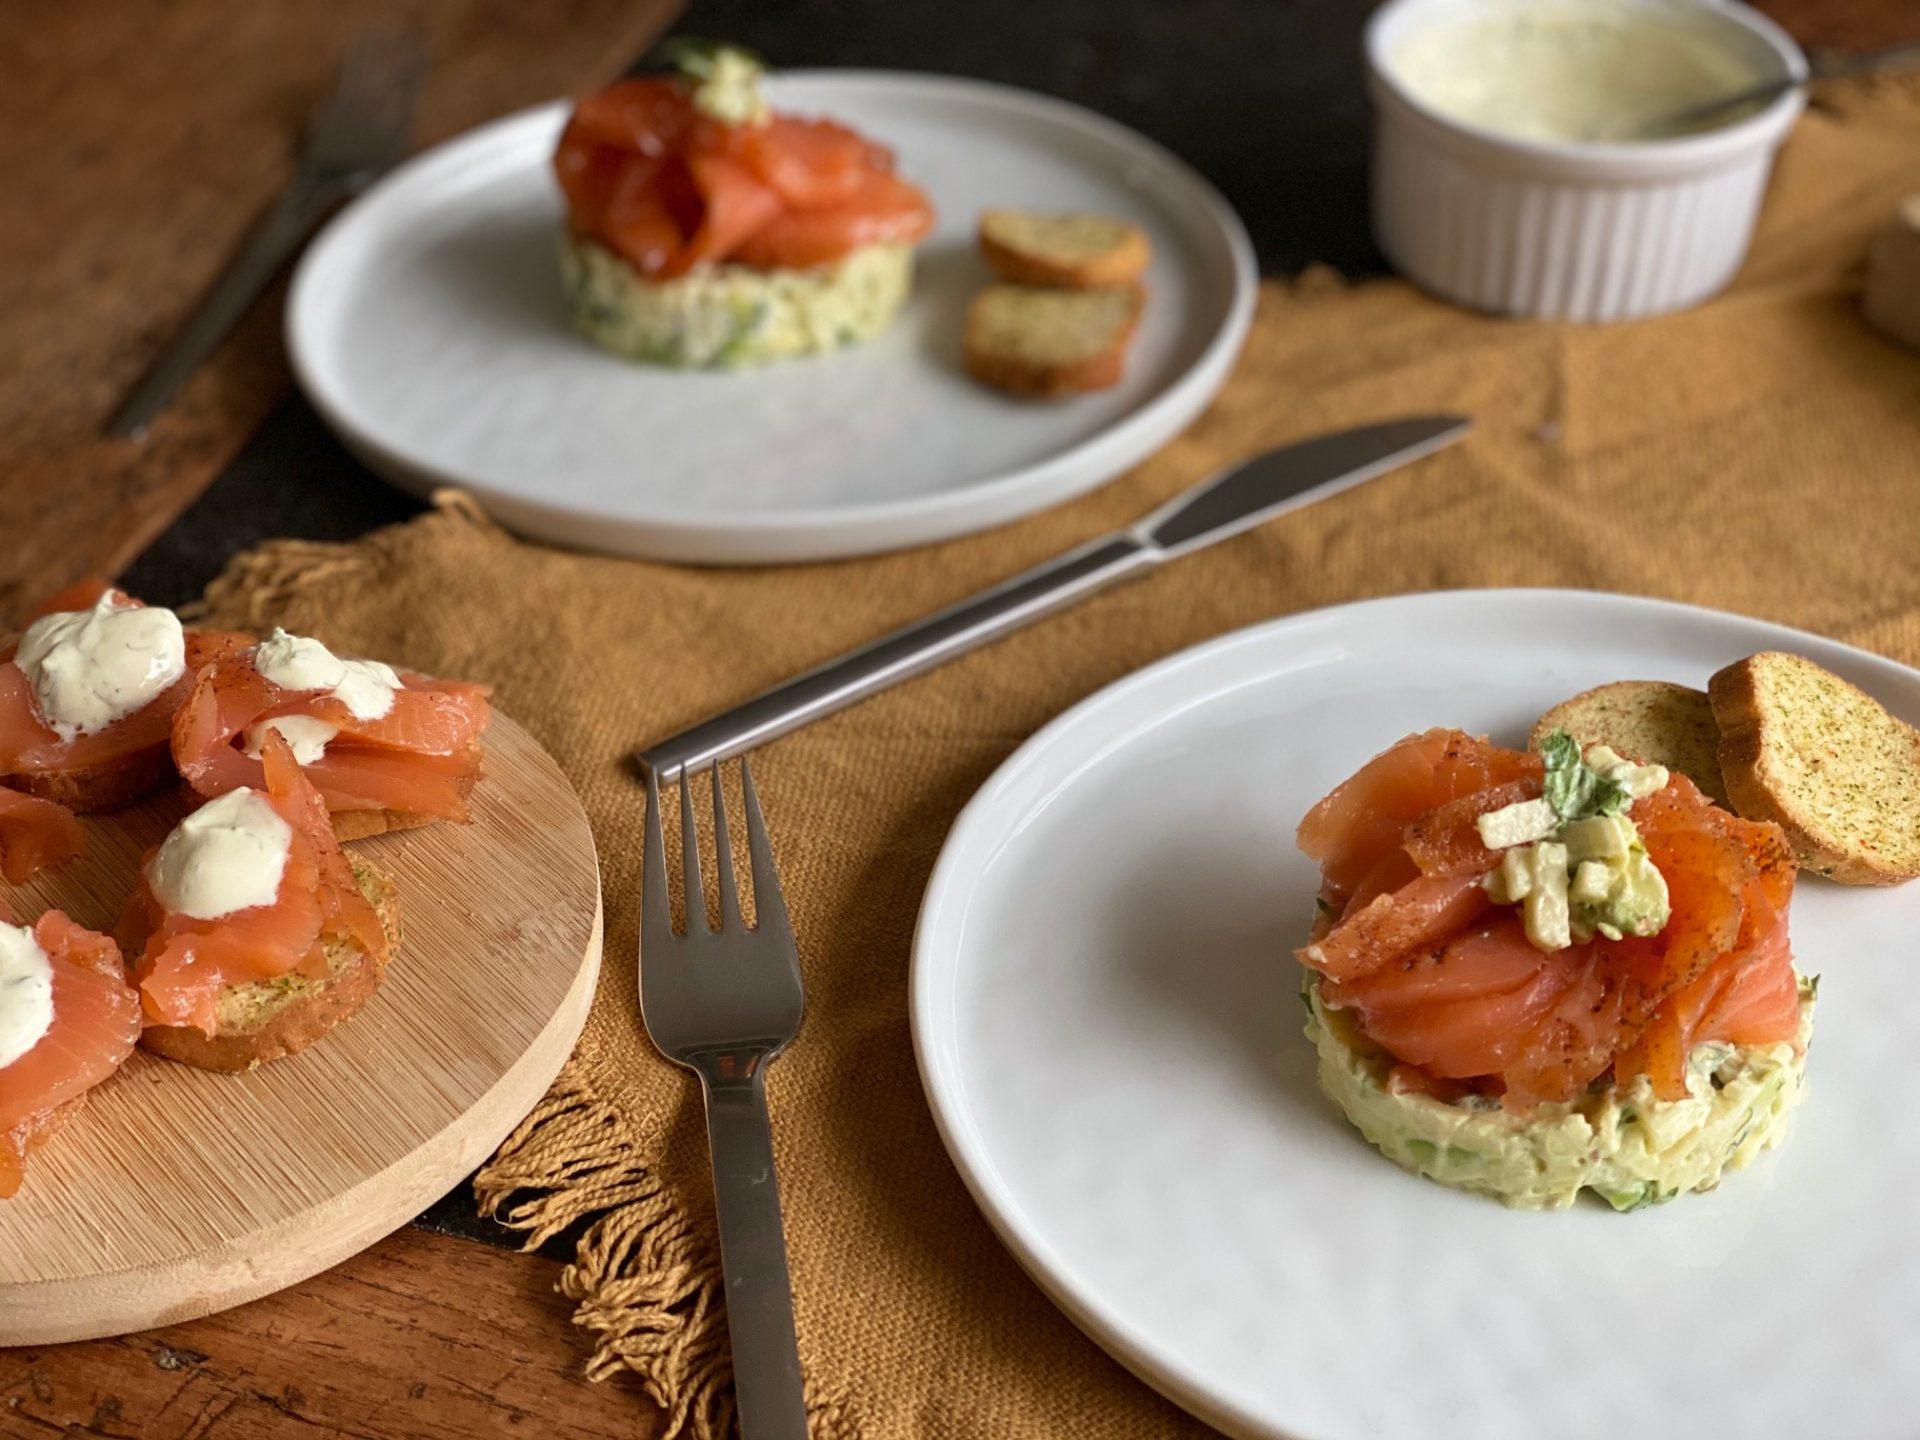 Gravad Lax torentje met frisse appel en avocado - Visrecepten van Foodblog Foodinista